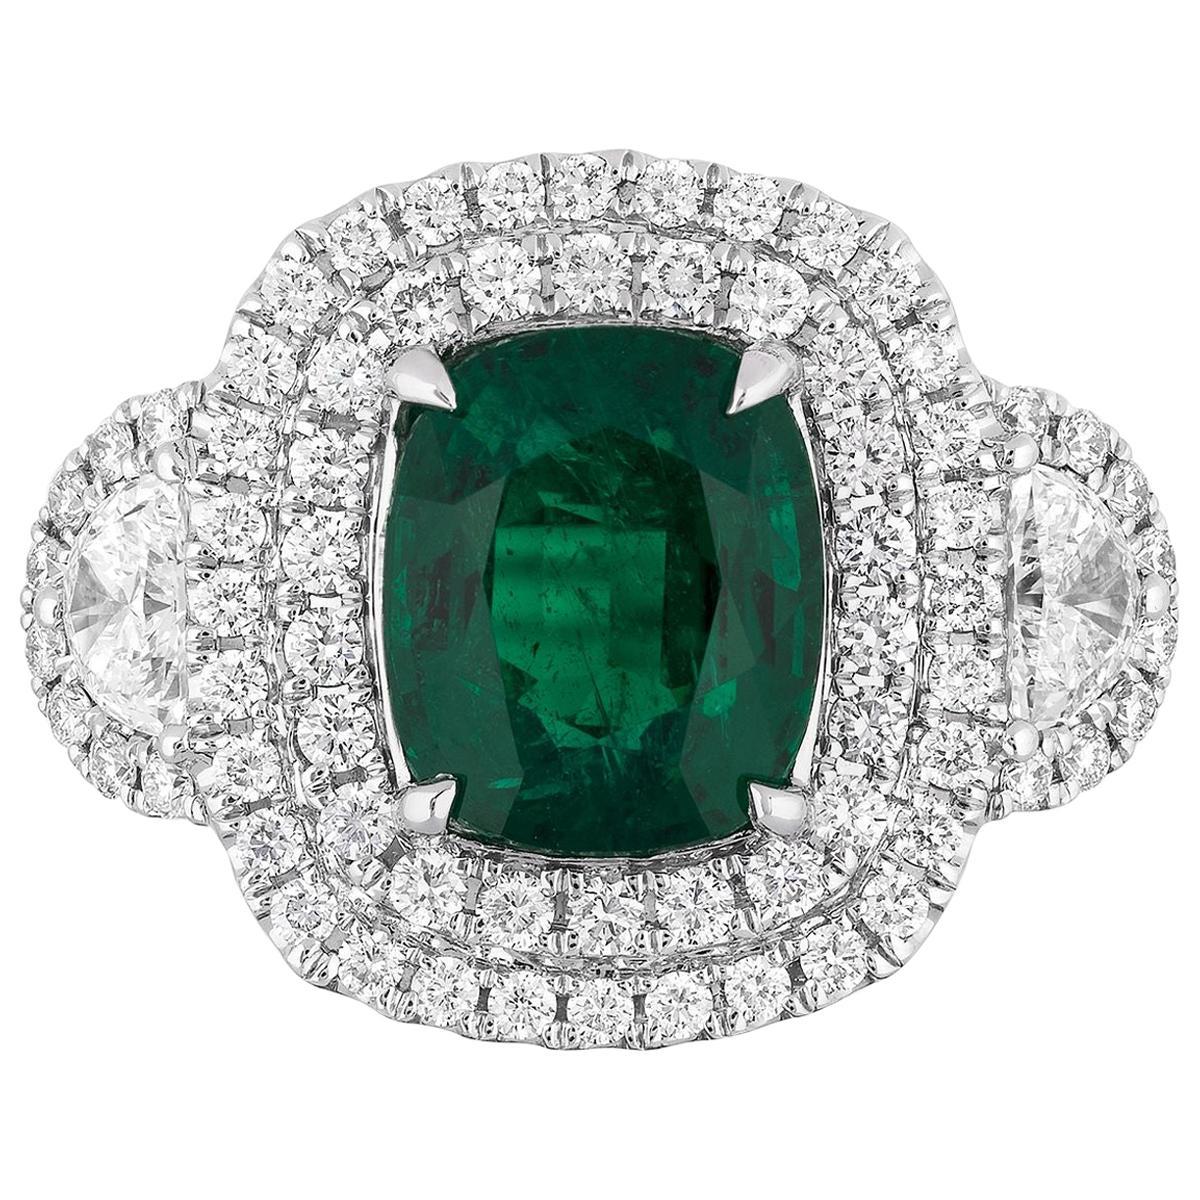 2.77 Carat Cushion Zambian Emerald Diamond Cocktail Ring